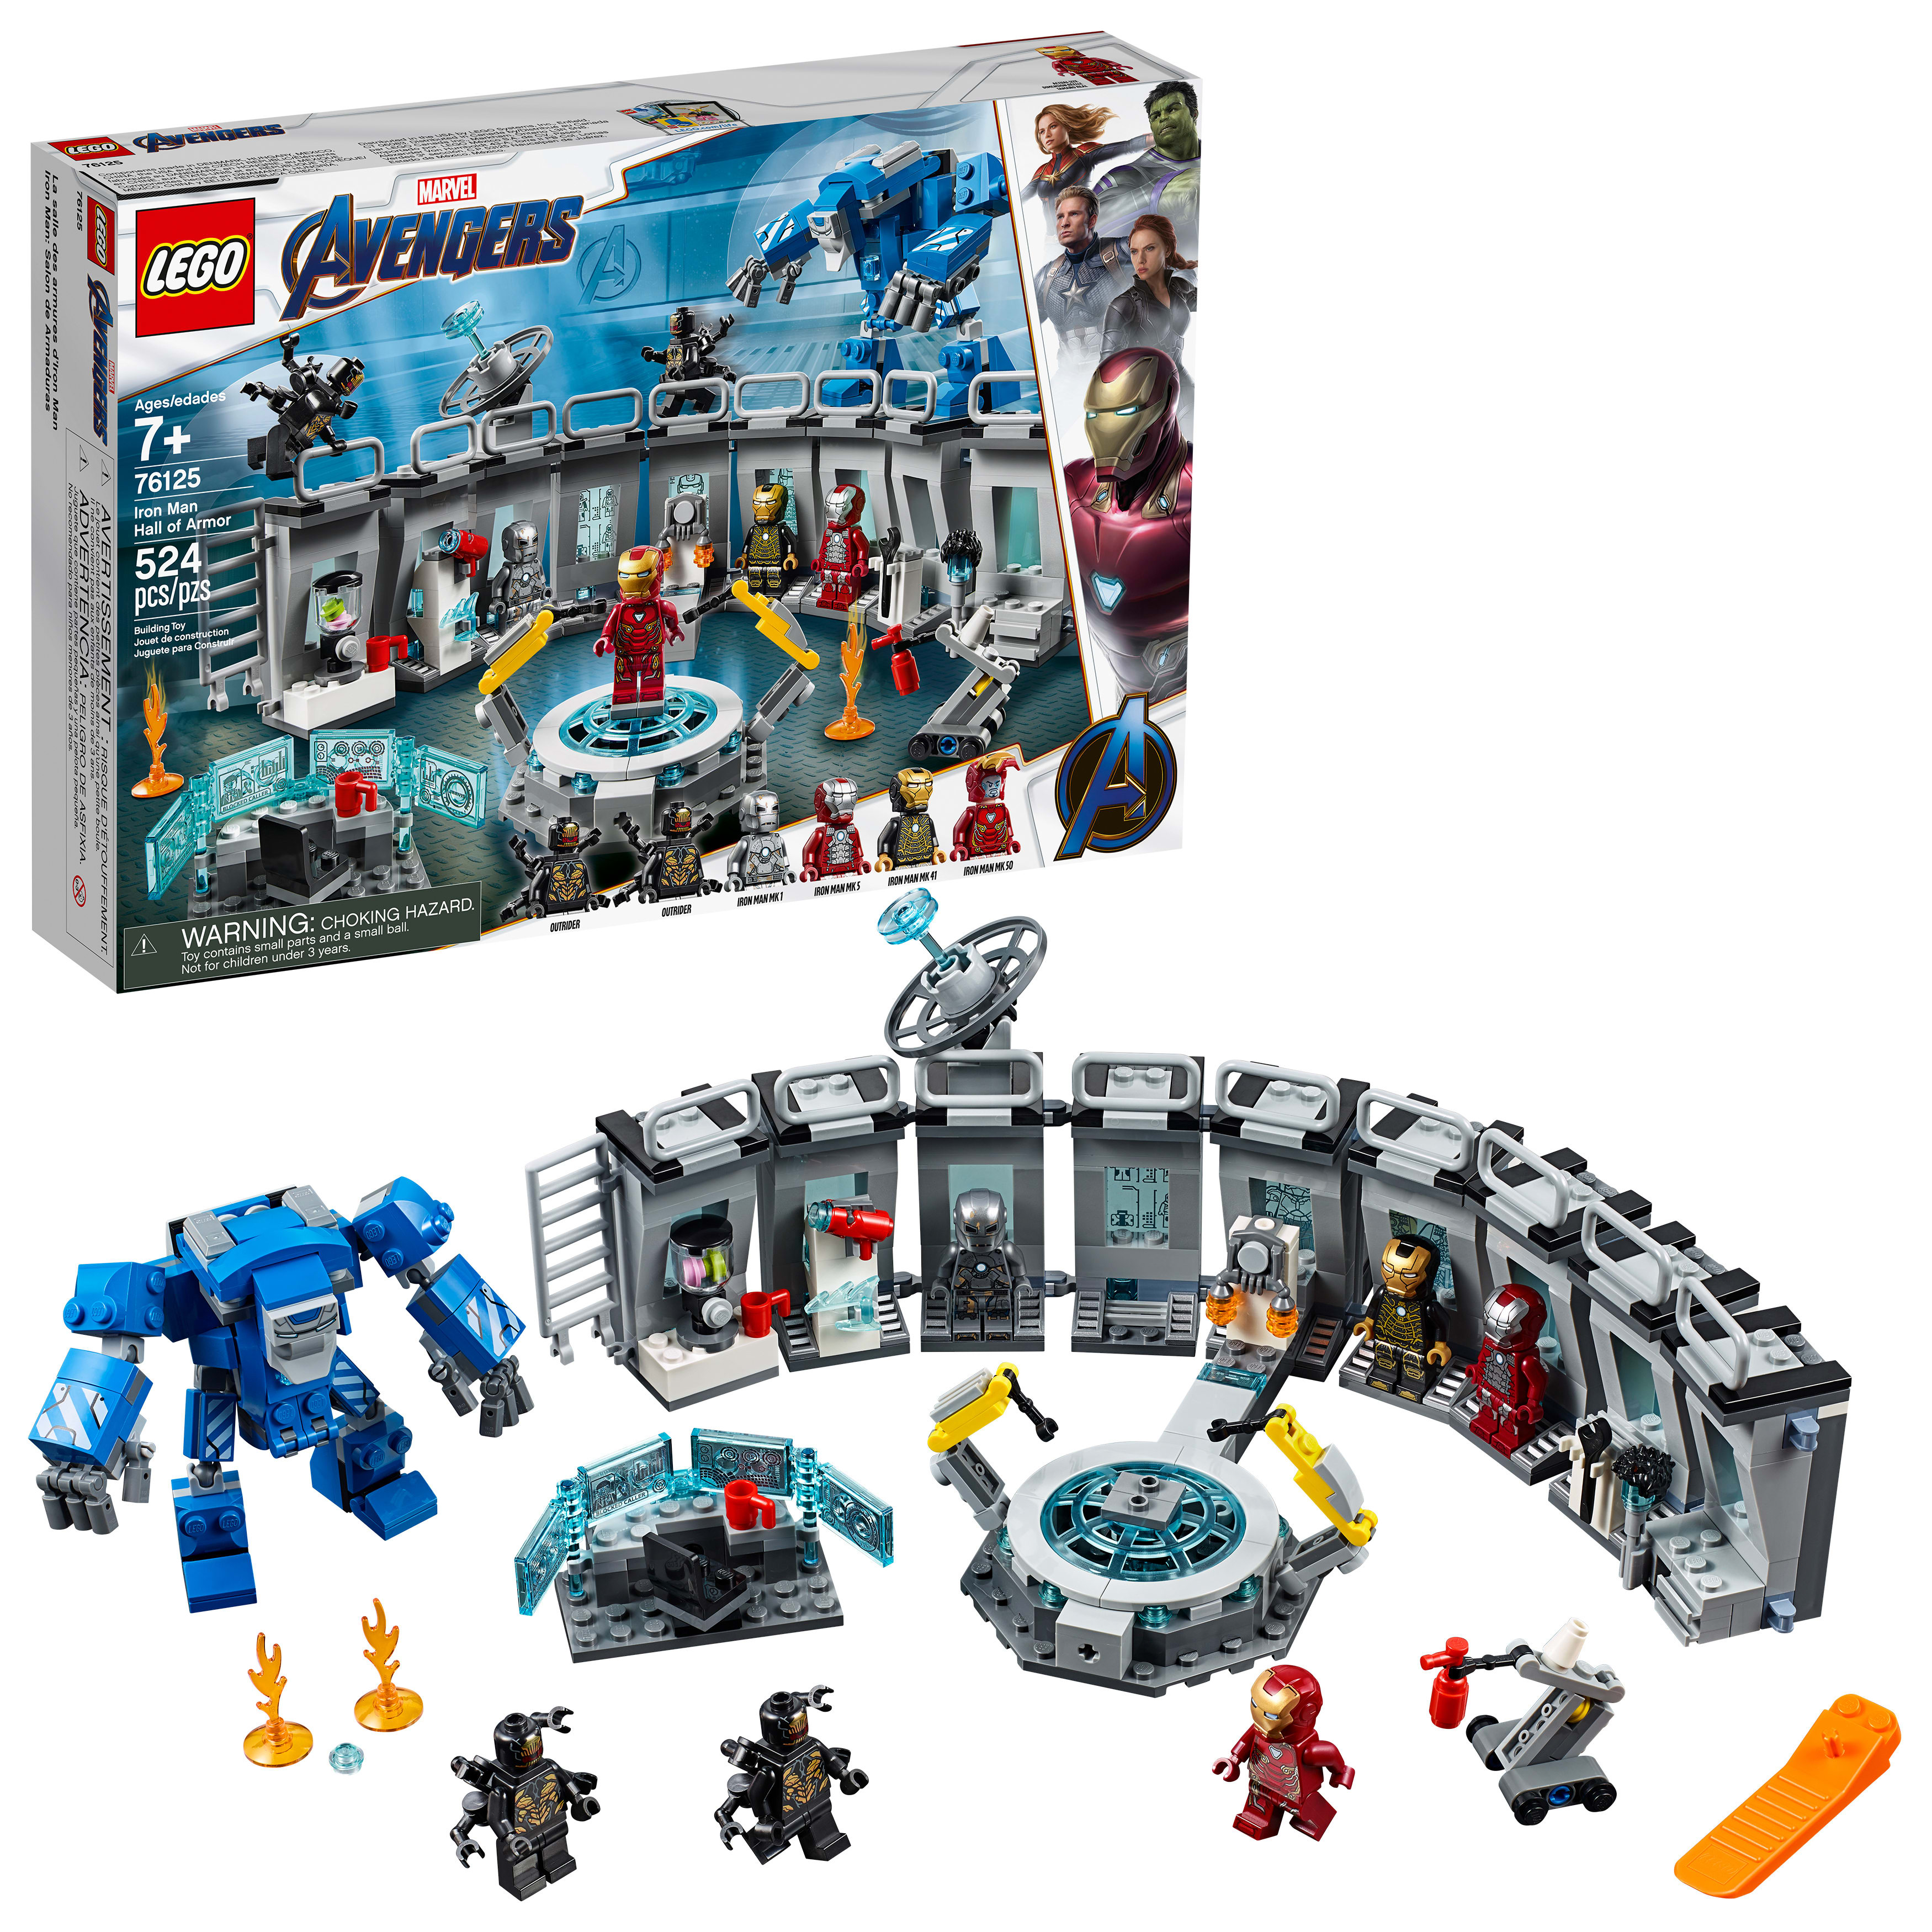 lego marvel avengers iron man hall of armor 76125 - HD3500×3500